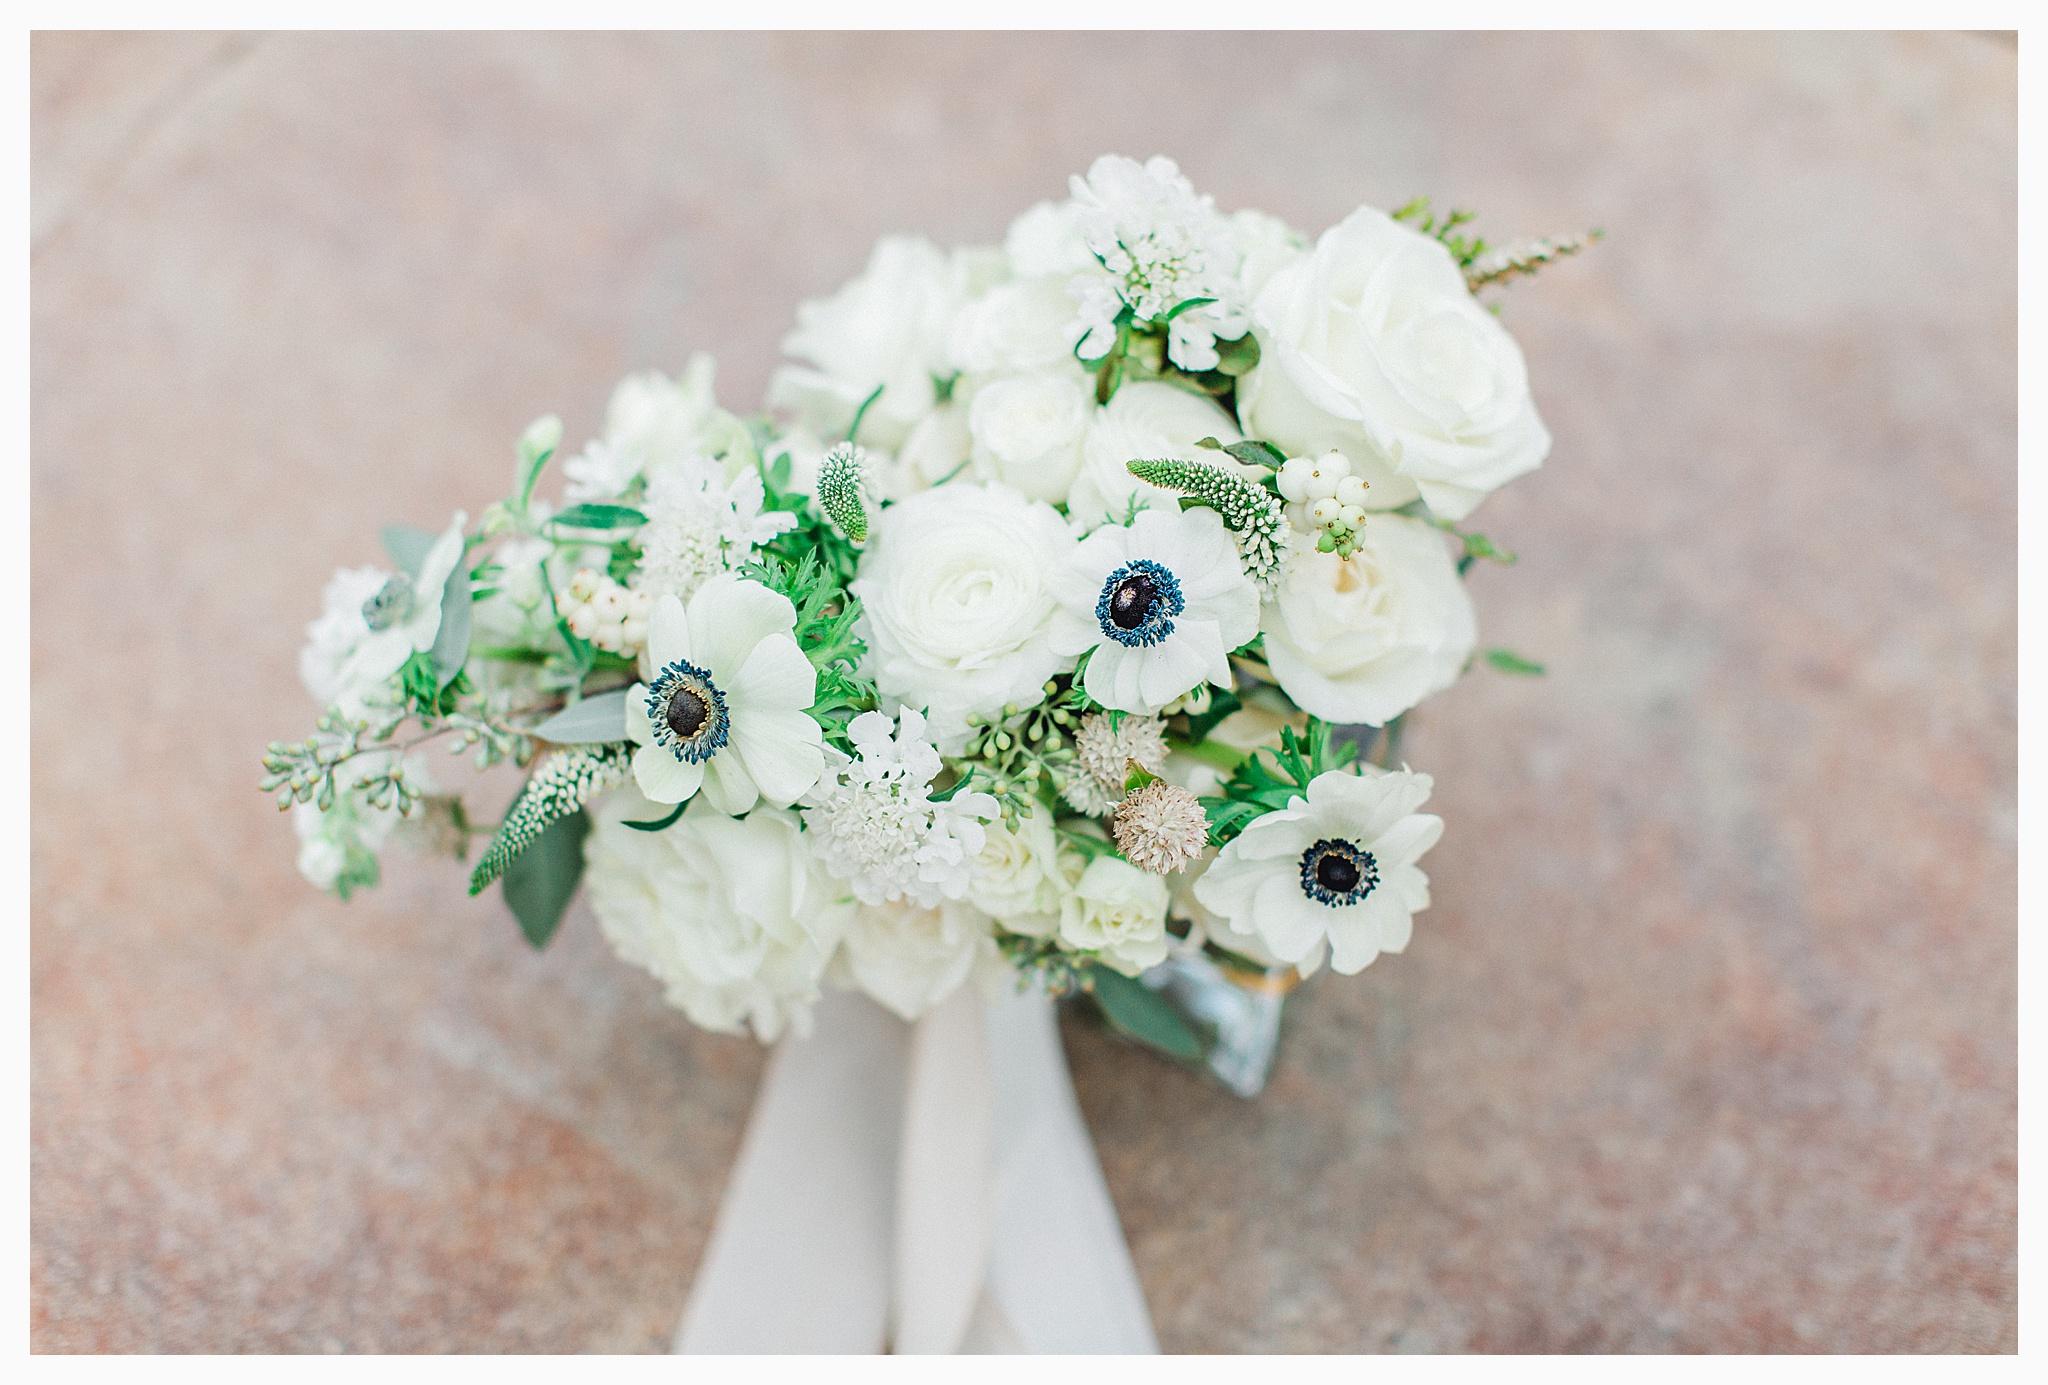 Emma Rose Company Light and Airy Wedding Photographer, Beautiful fall wedding at Rock Creek Gardens Venue in Puyallup, Washington._0002.jpg